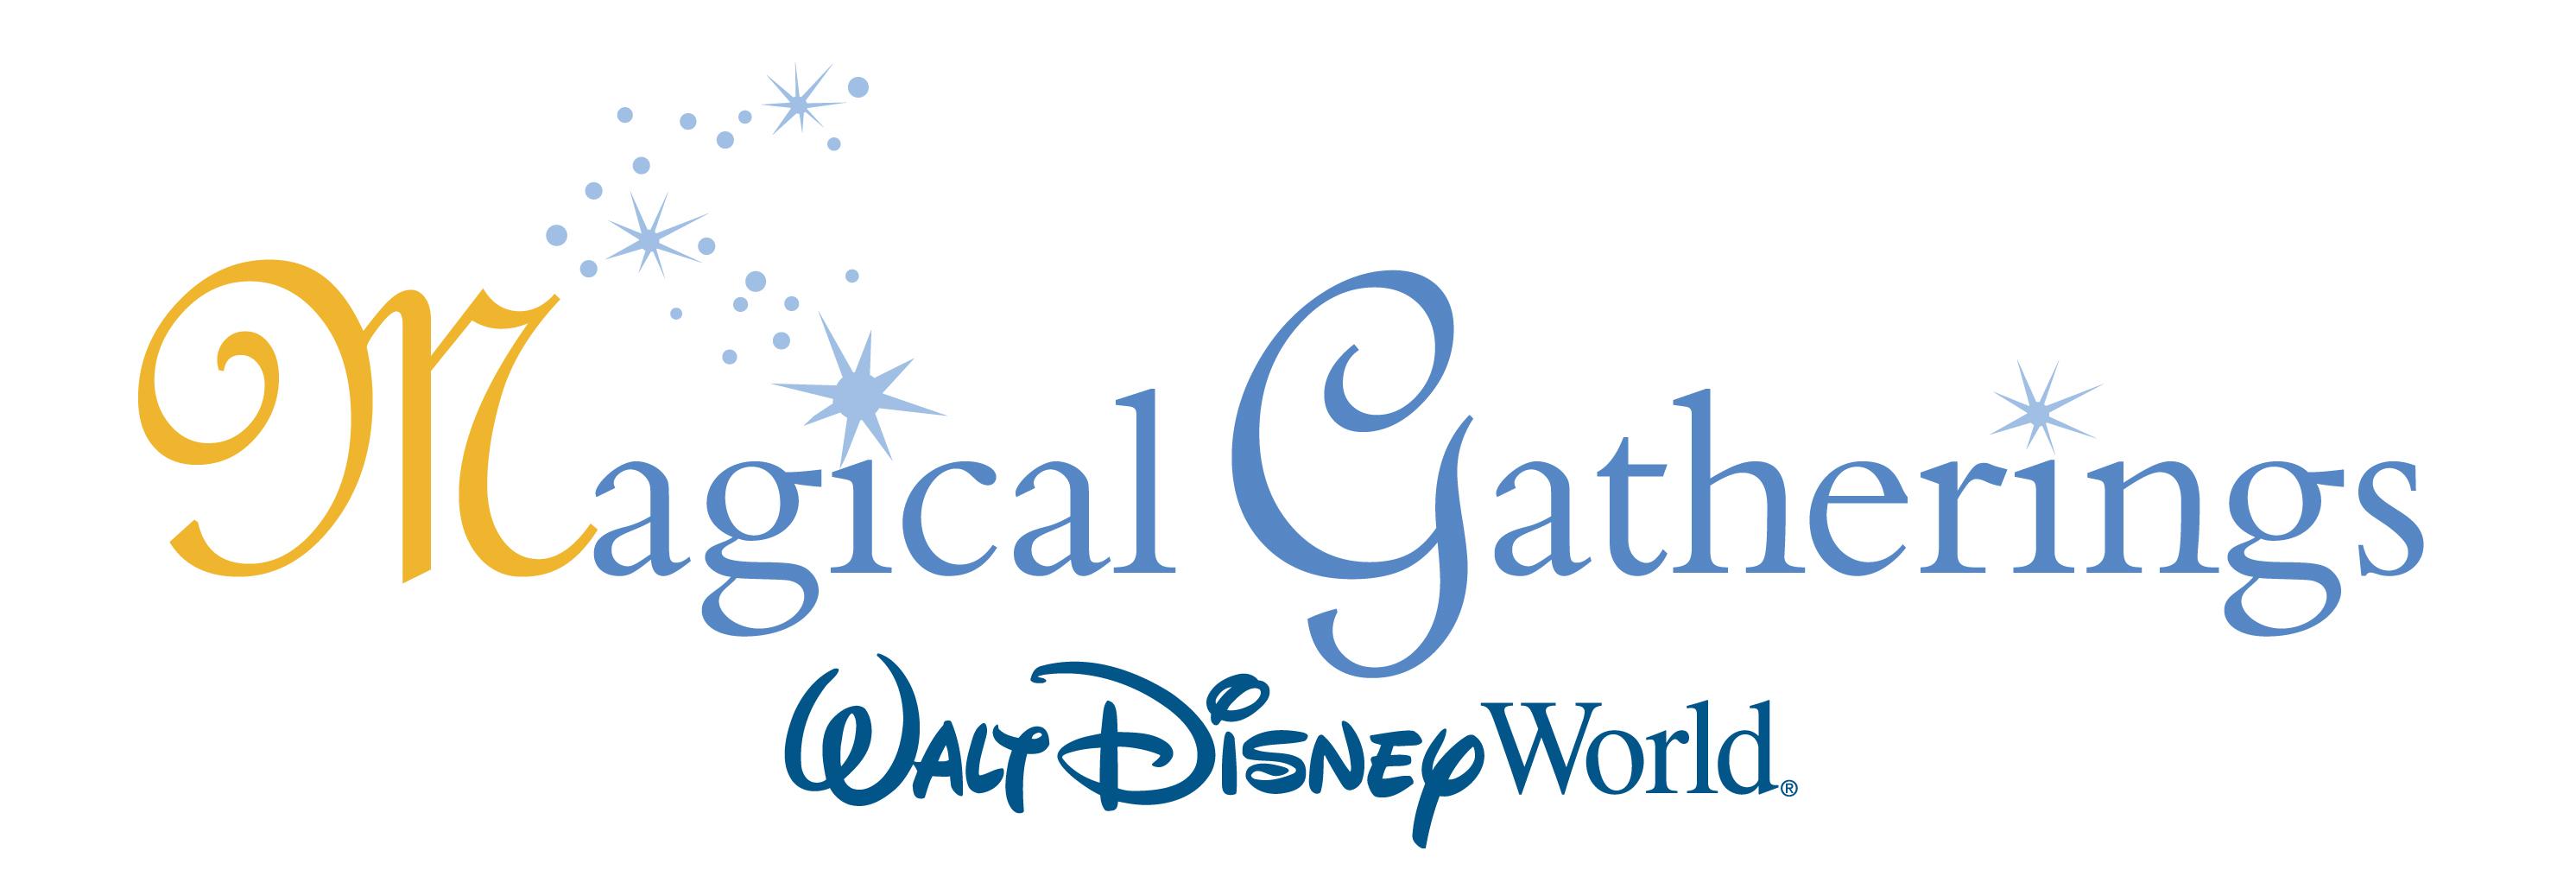 Walt Disney World Clipart - Clipart Kid